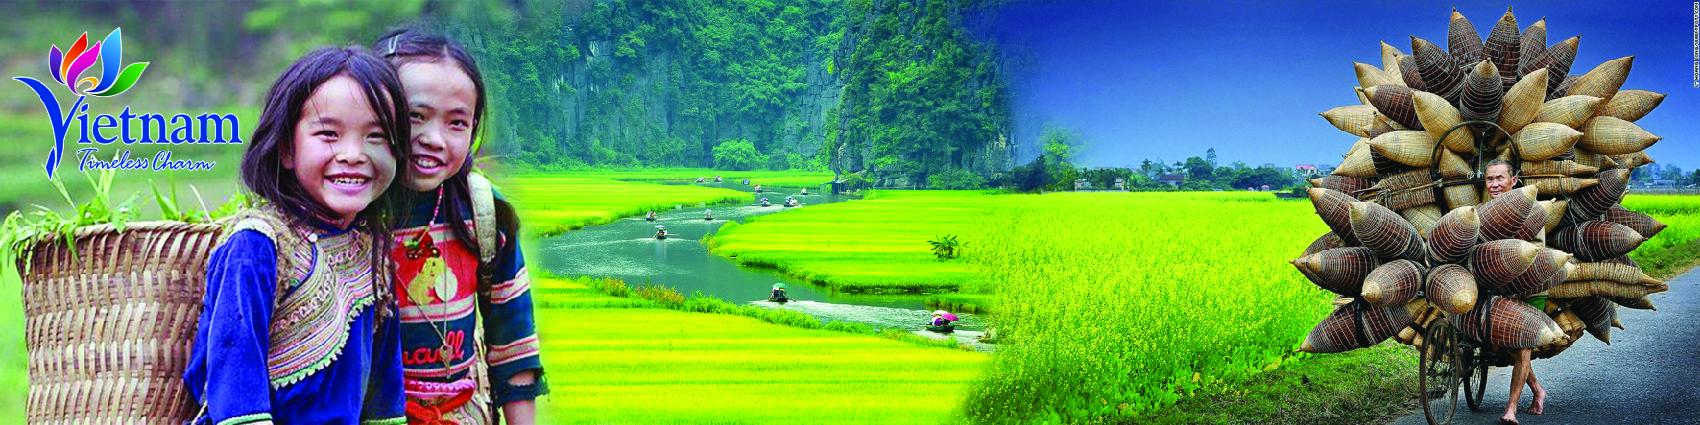 http://indochinatravelland.com/trails-of-the-north-vietnam-8-day-7-night